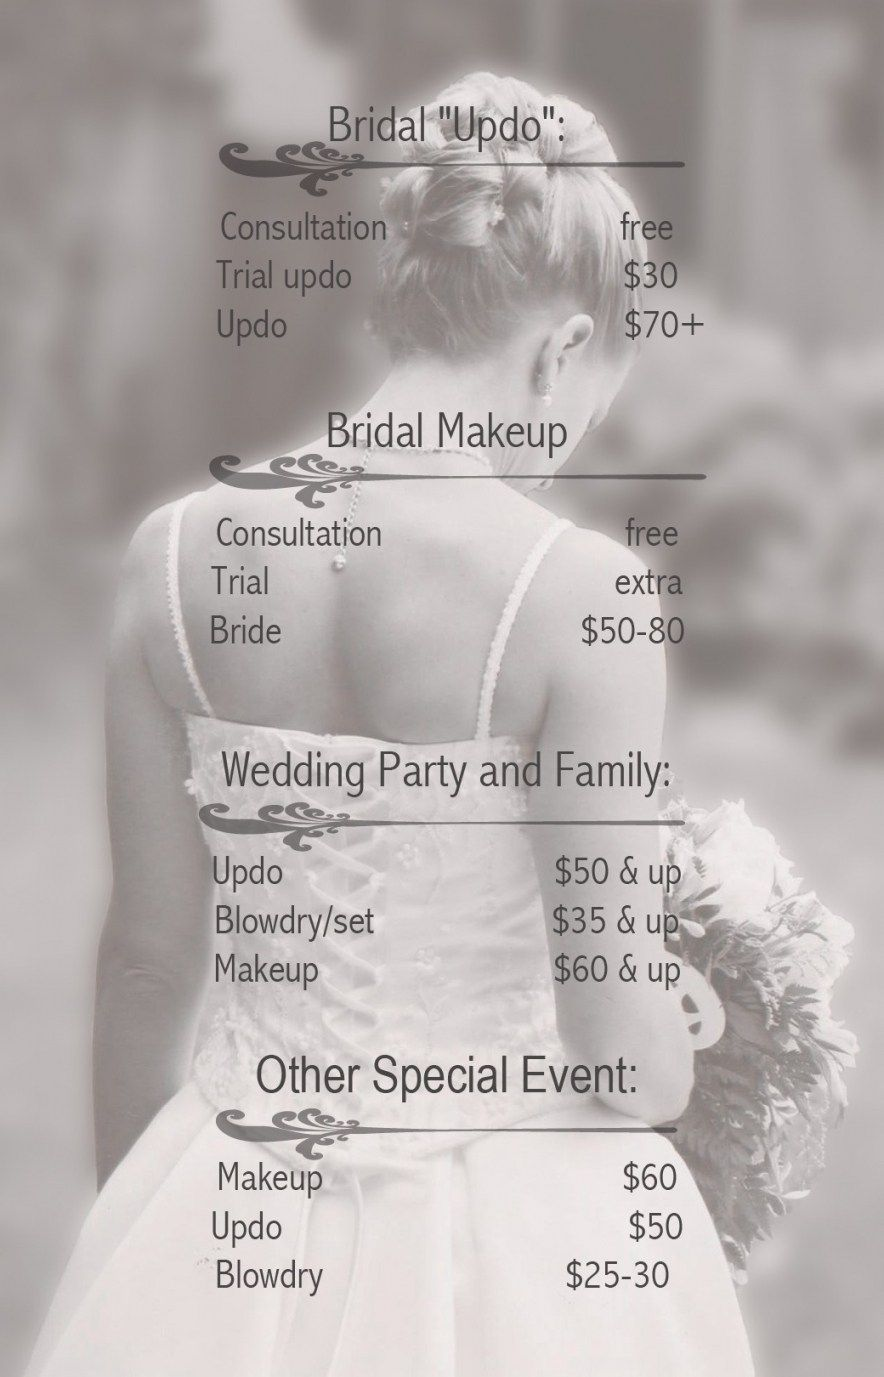 Wedding Hairstyles Prices Bridesmaid Hair Makeup Wedding Hairdressers Braided Hairstyles For Wedding